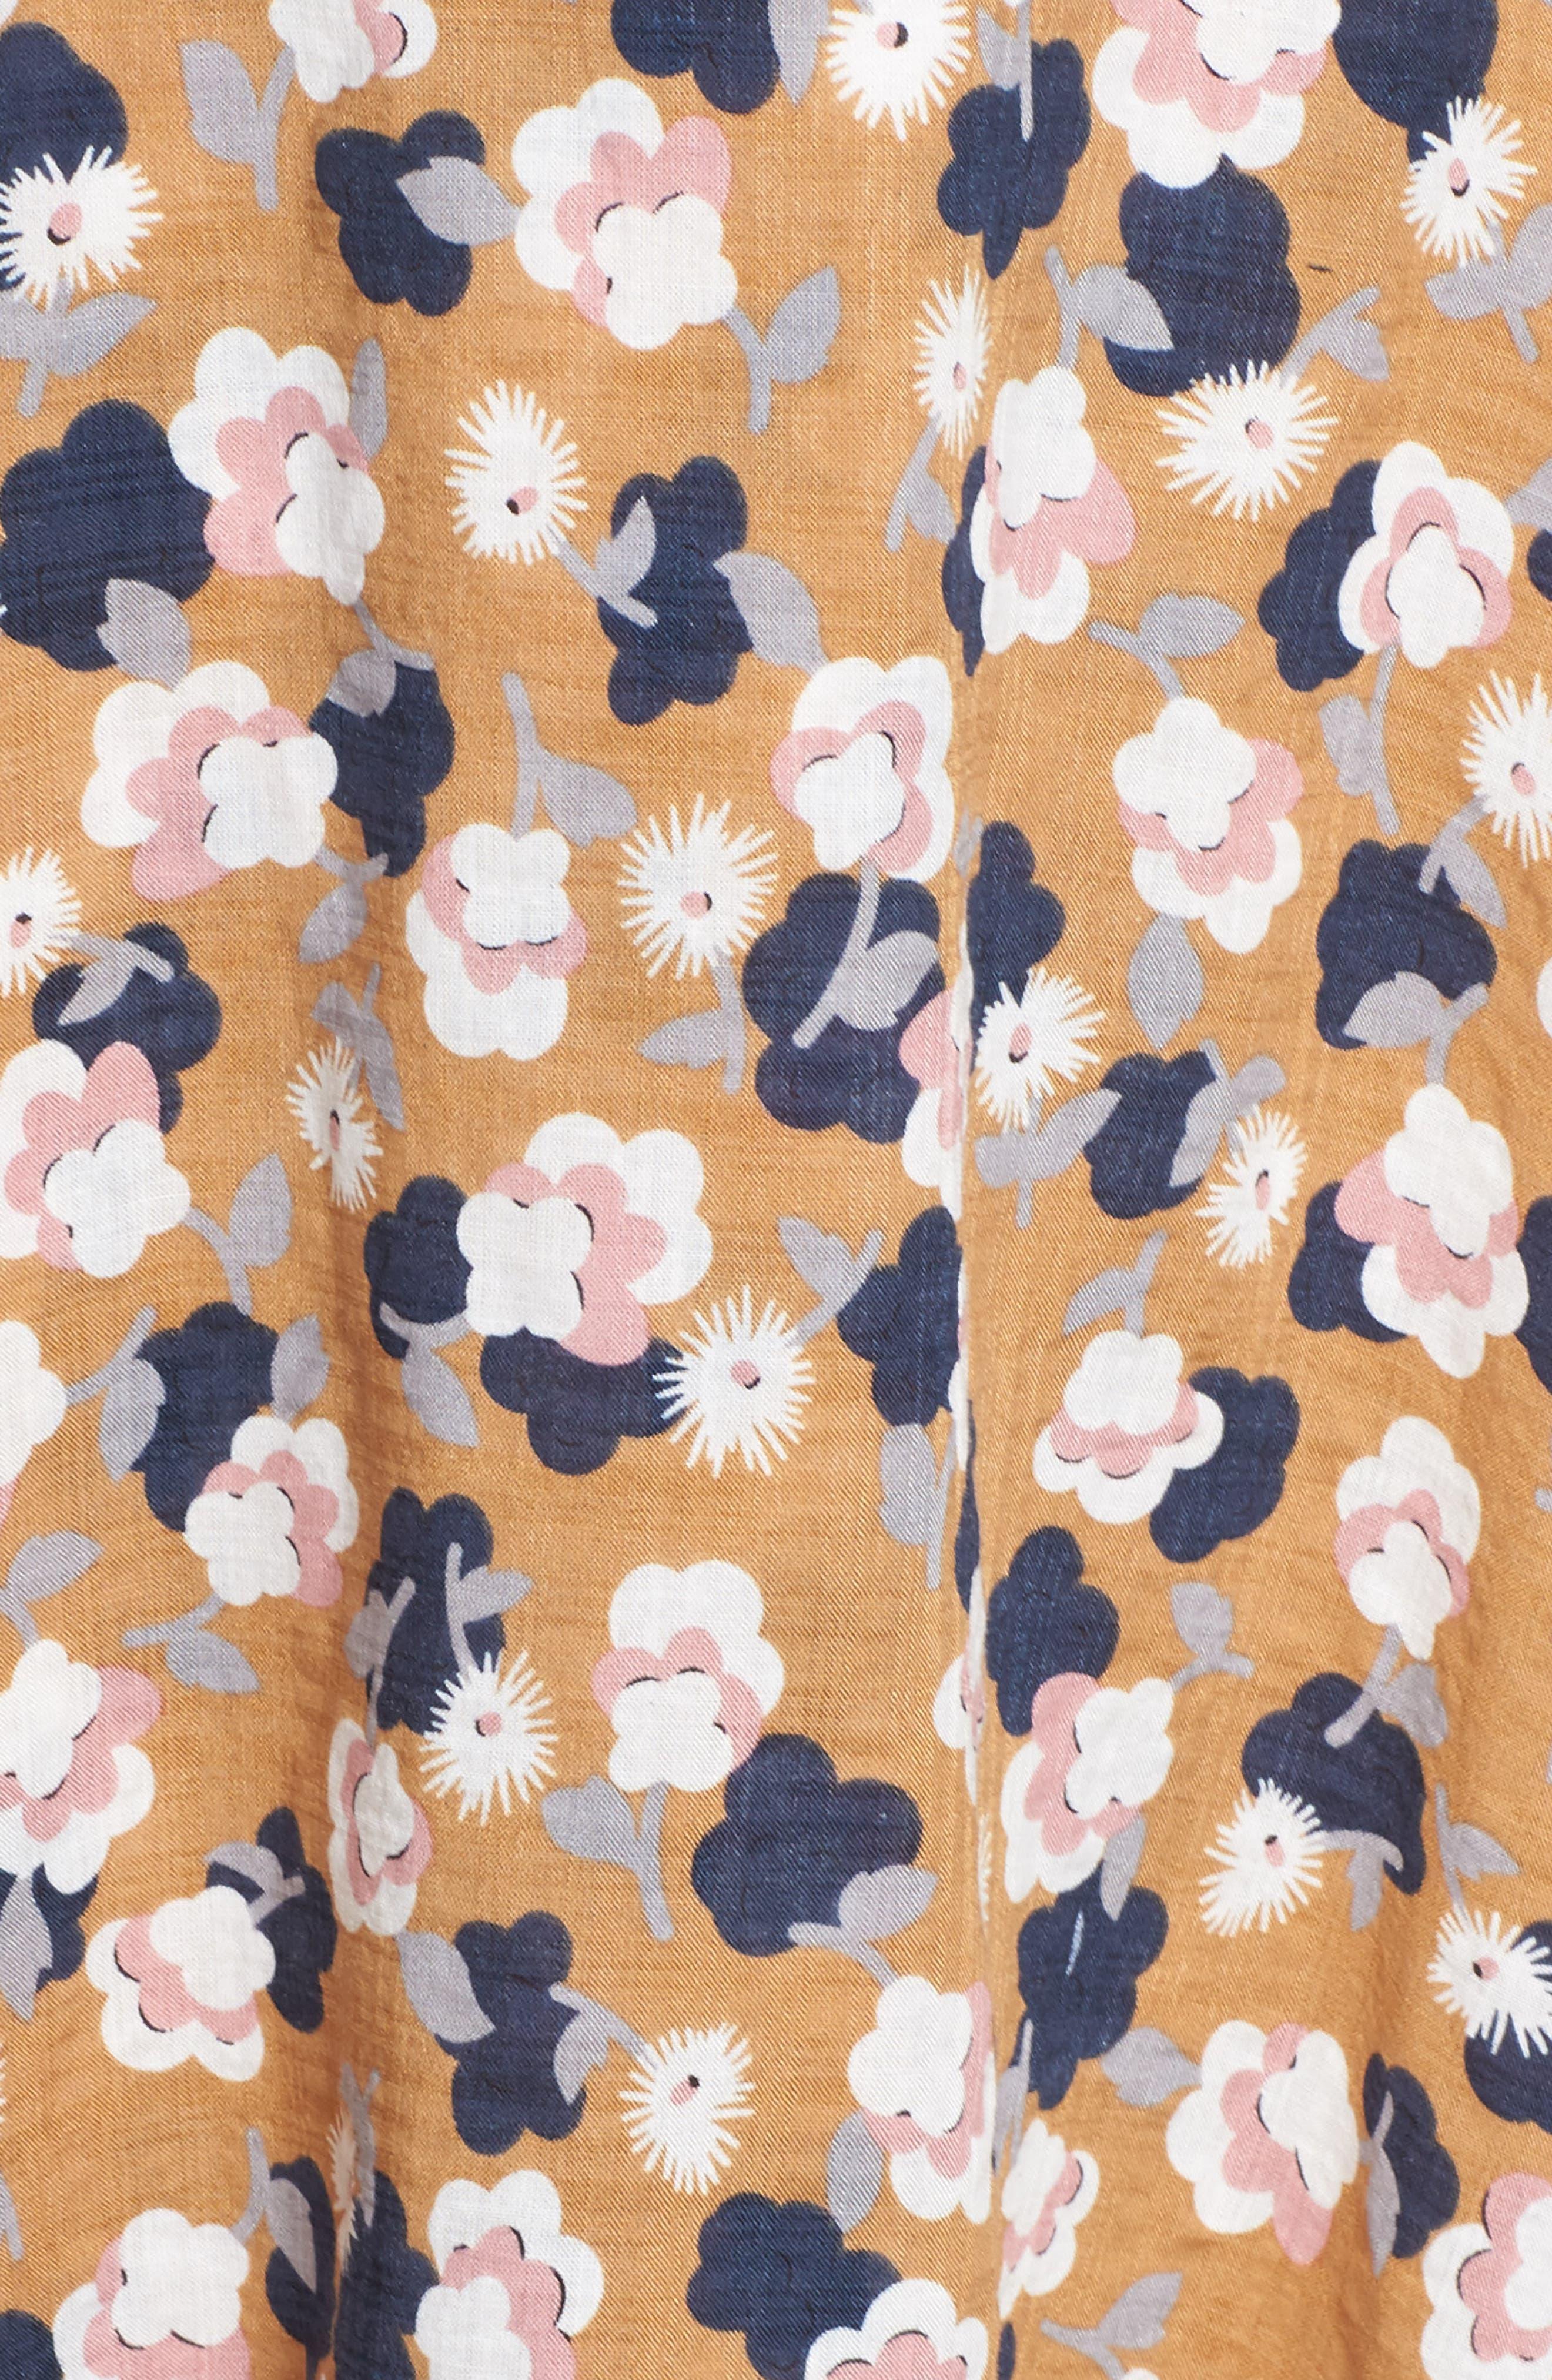 Floral Maxi Dress,                             Alternate thumbnail 5, color,                             750